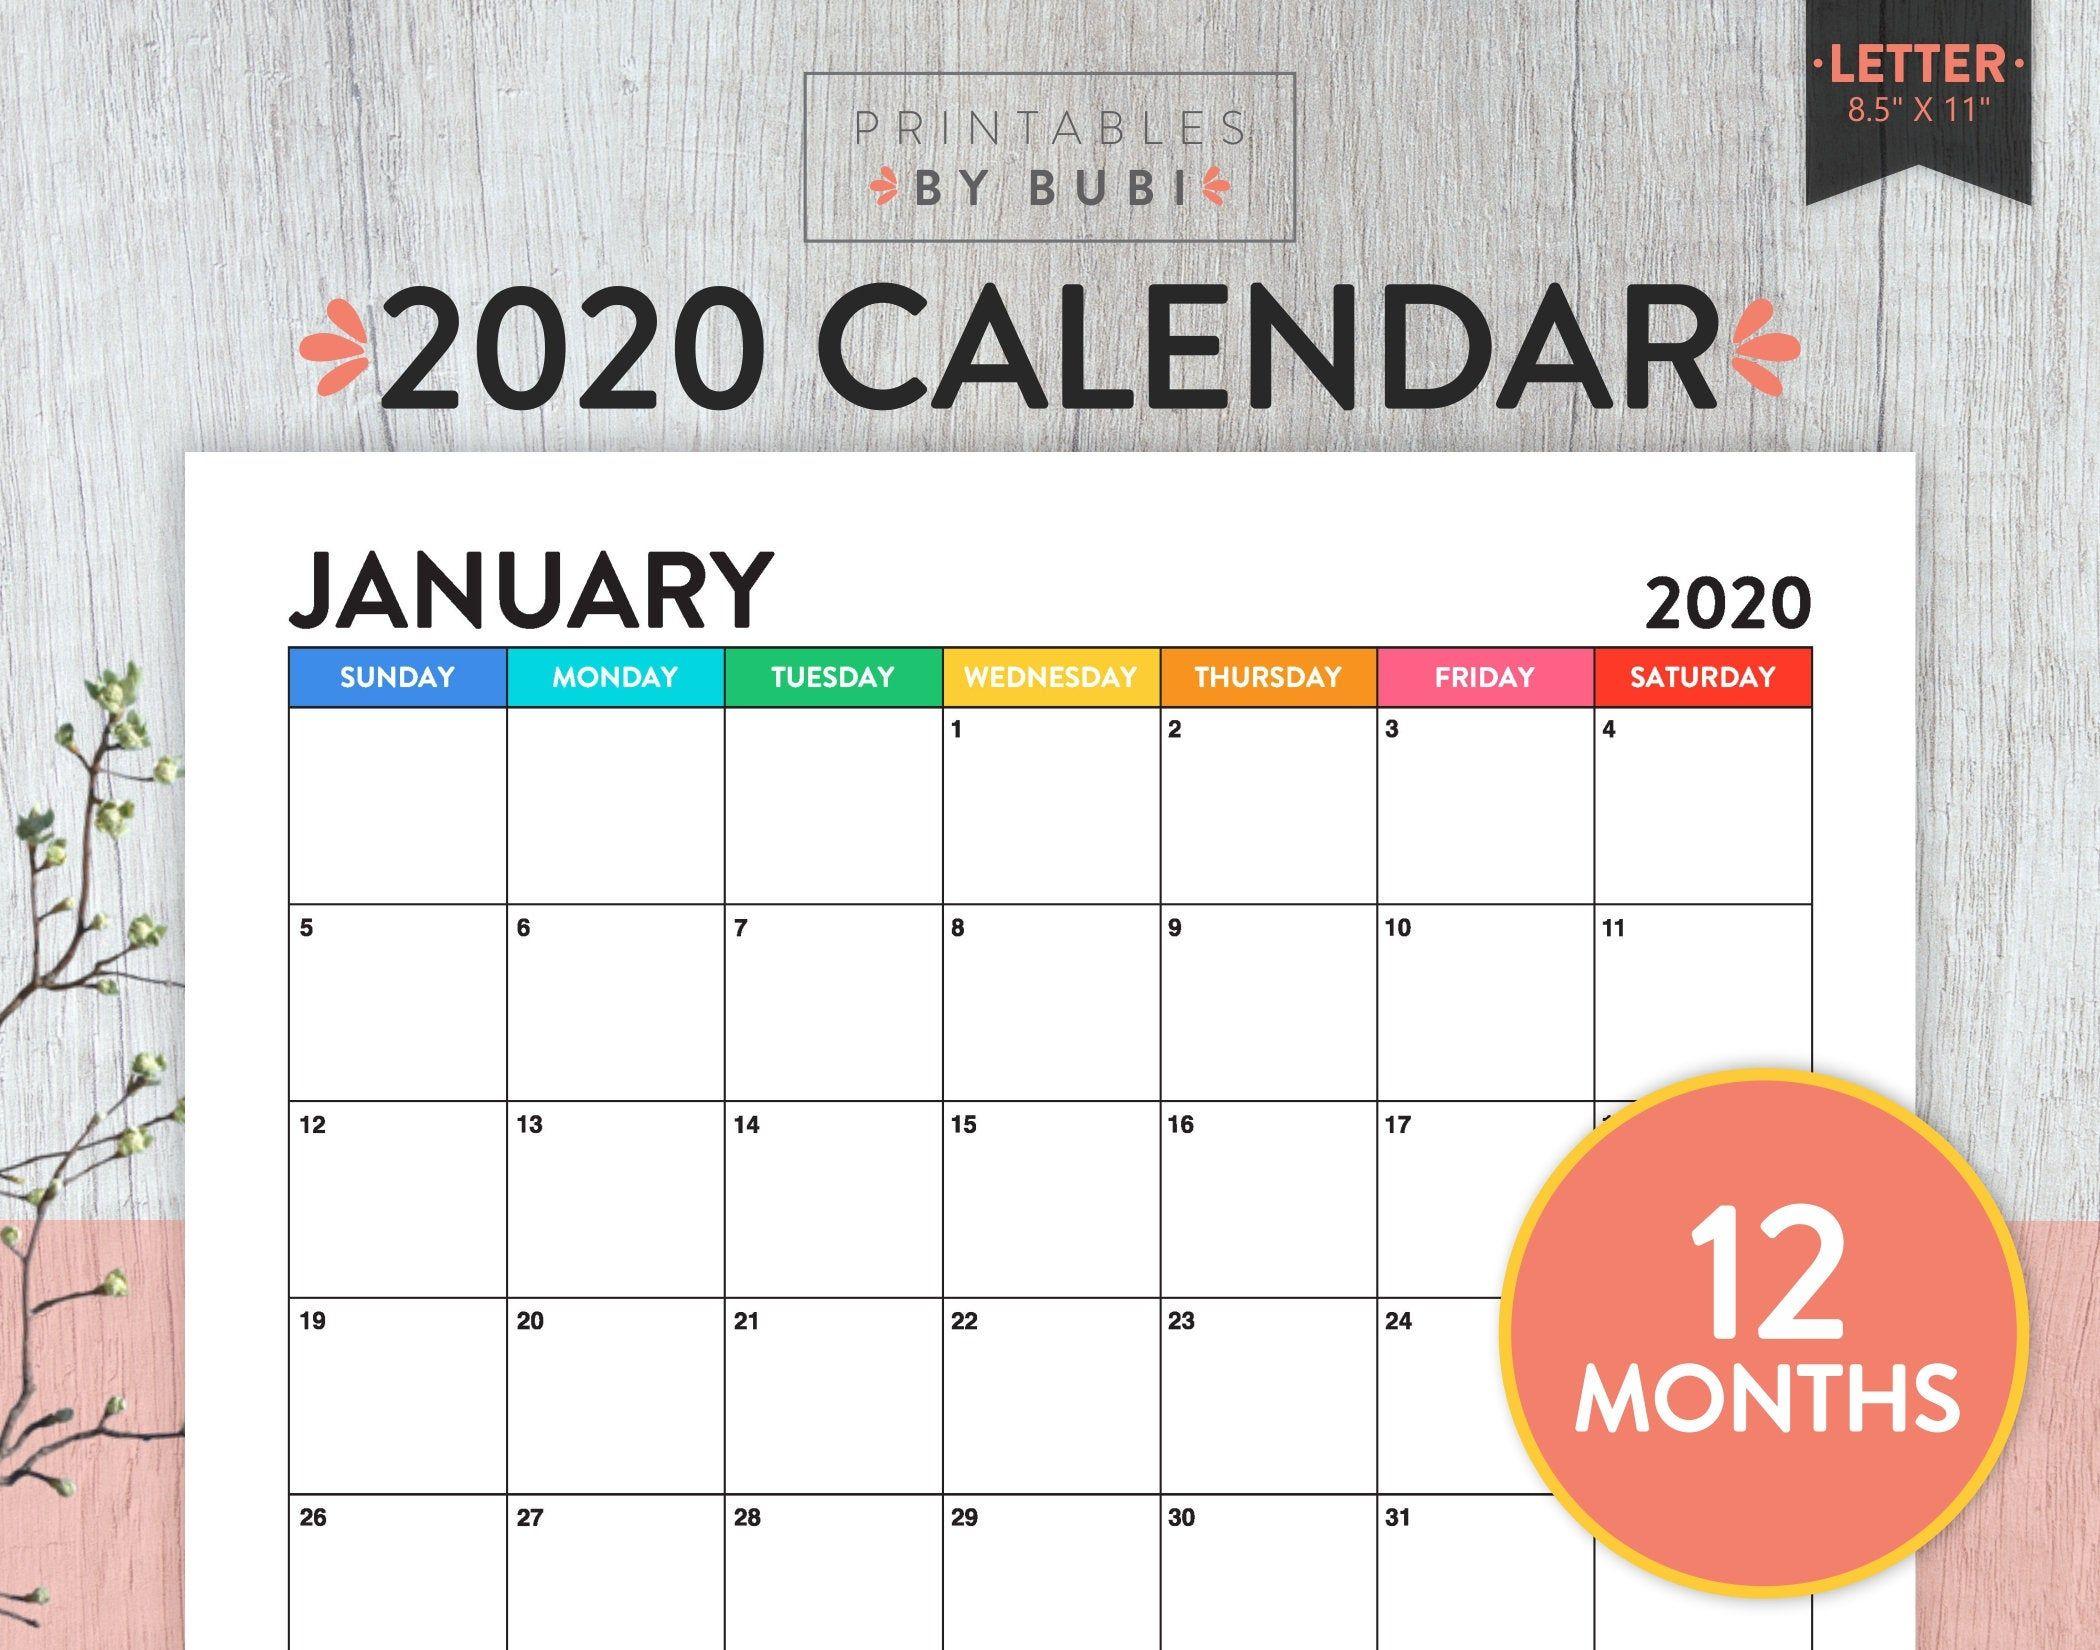 Printable Monthly Calendar 2020 Calendar Printable 2020 Wall